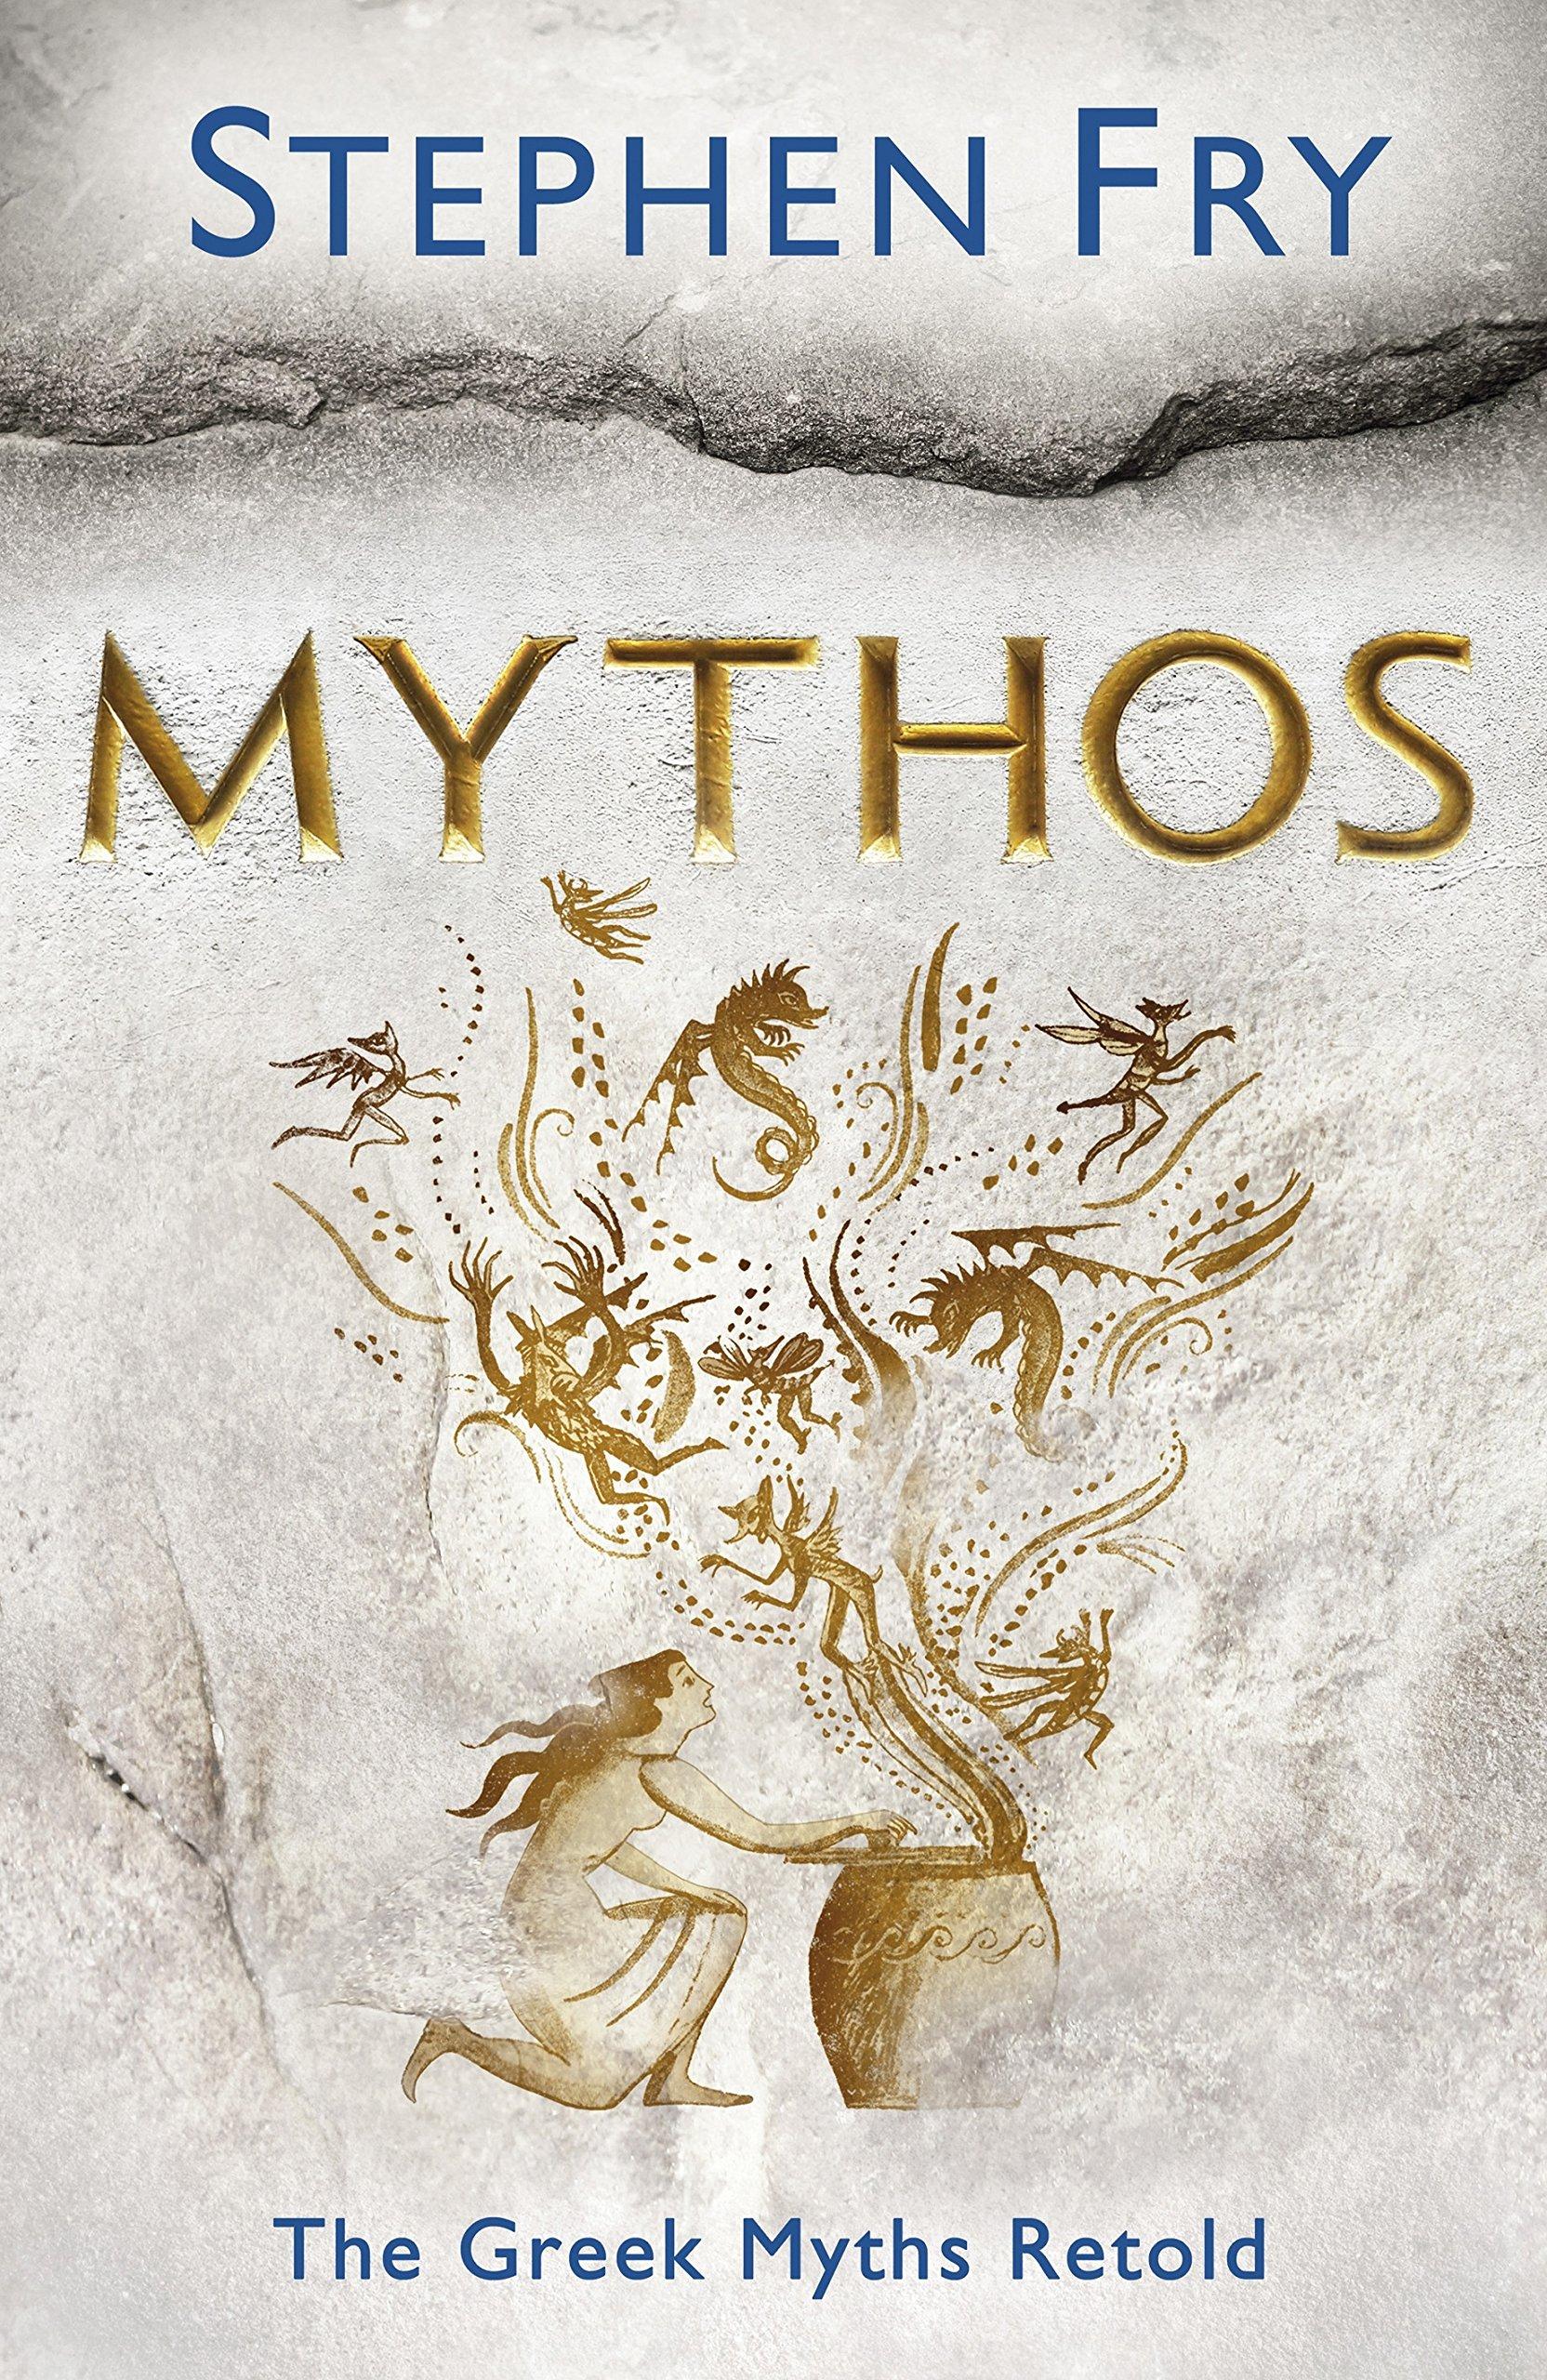 Mythos The Greek Myths Retold Stephen Fry S Greek Myths Amazon Co Uk Fry Stephen Fry Stephen 9781405934329 Books